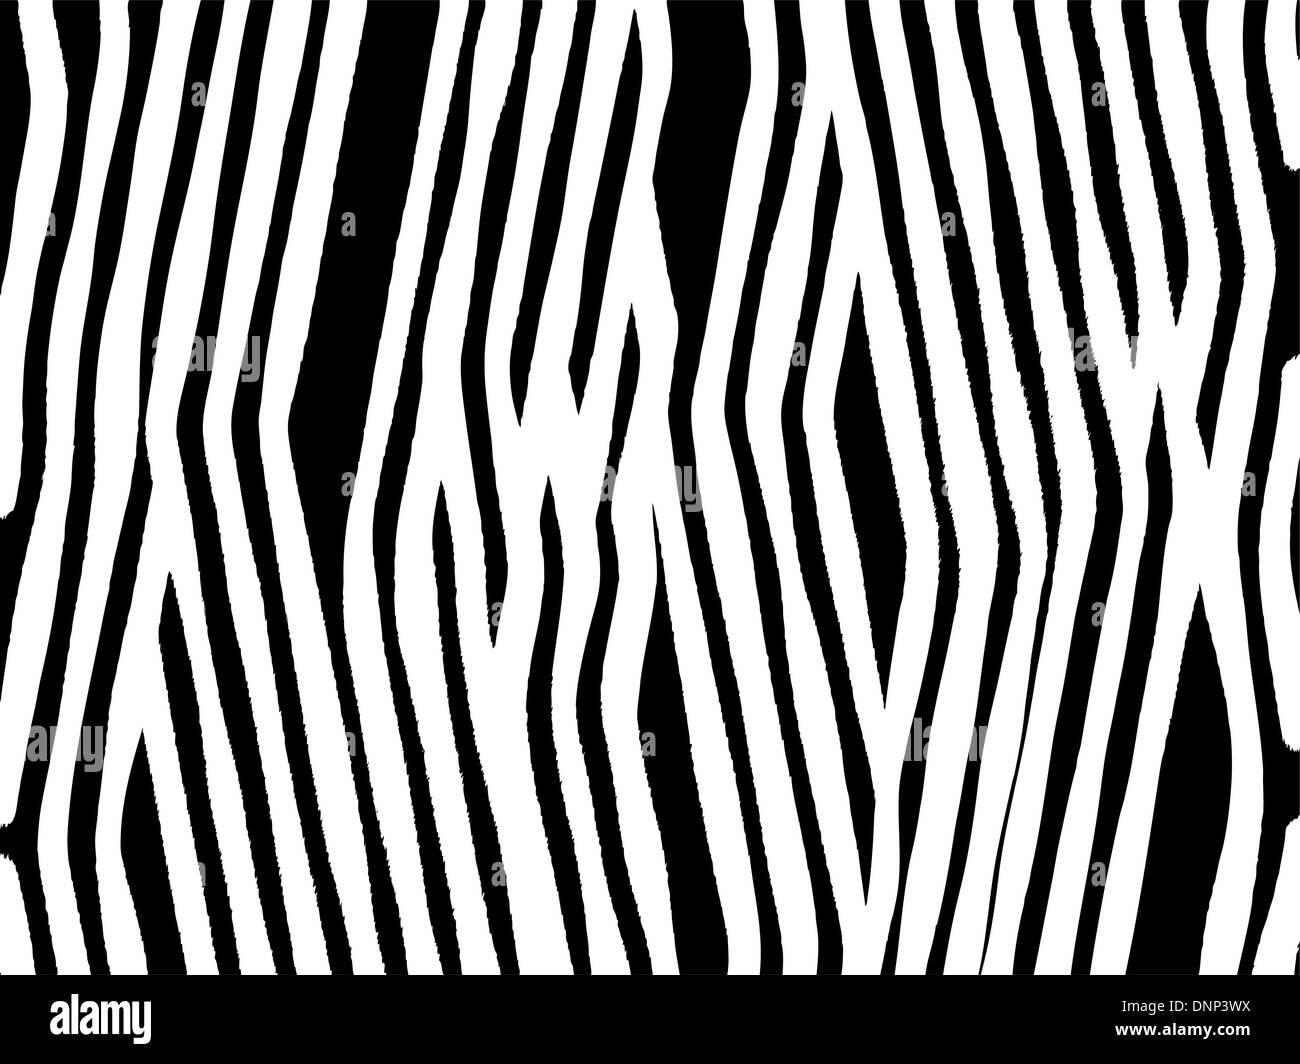 Zebra print background - Stock Image